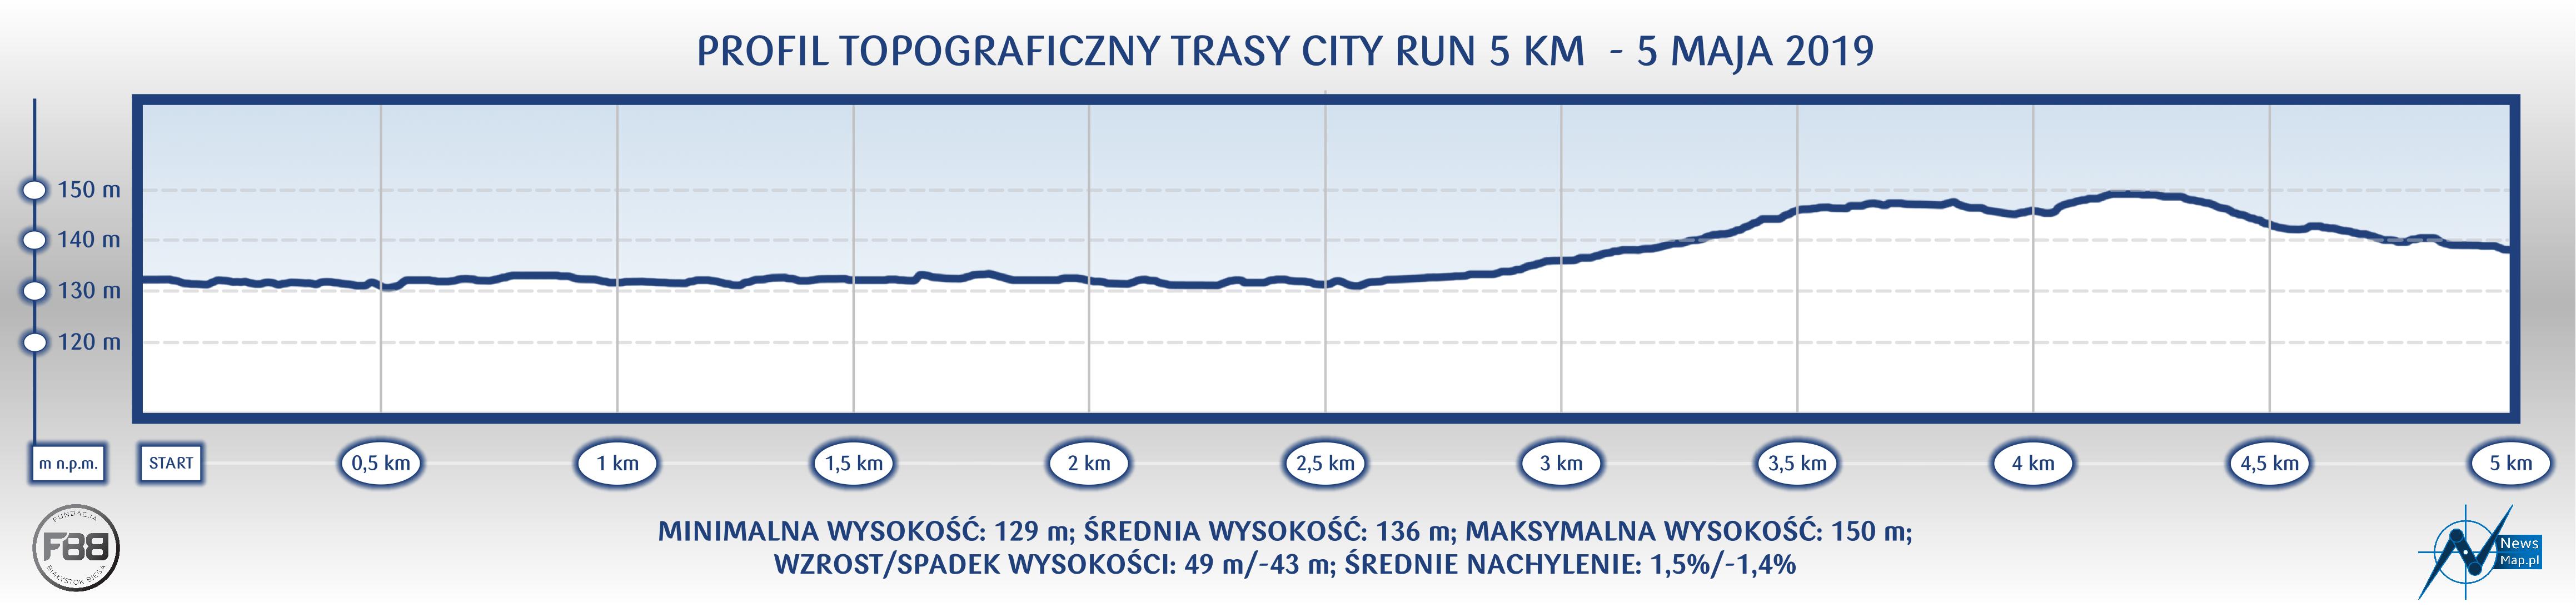 City Run - profil topograficzny